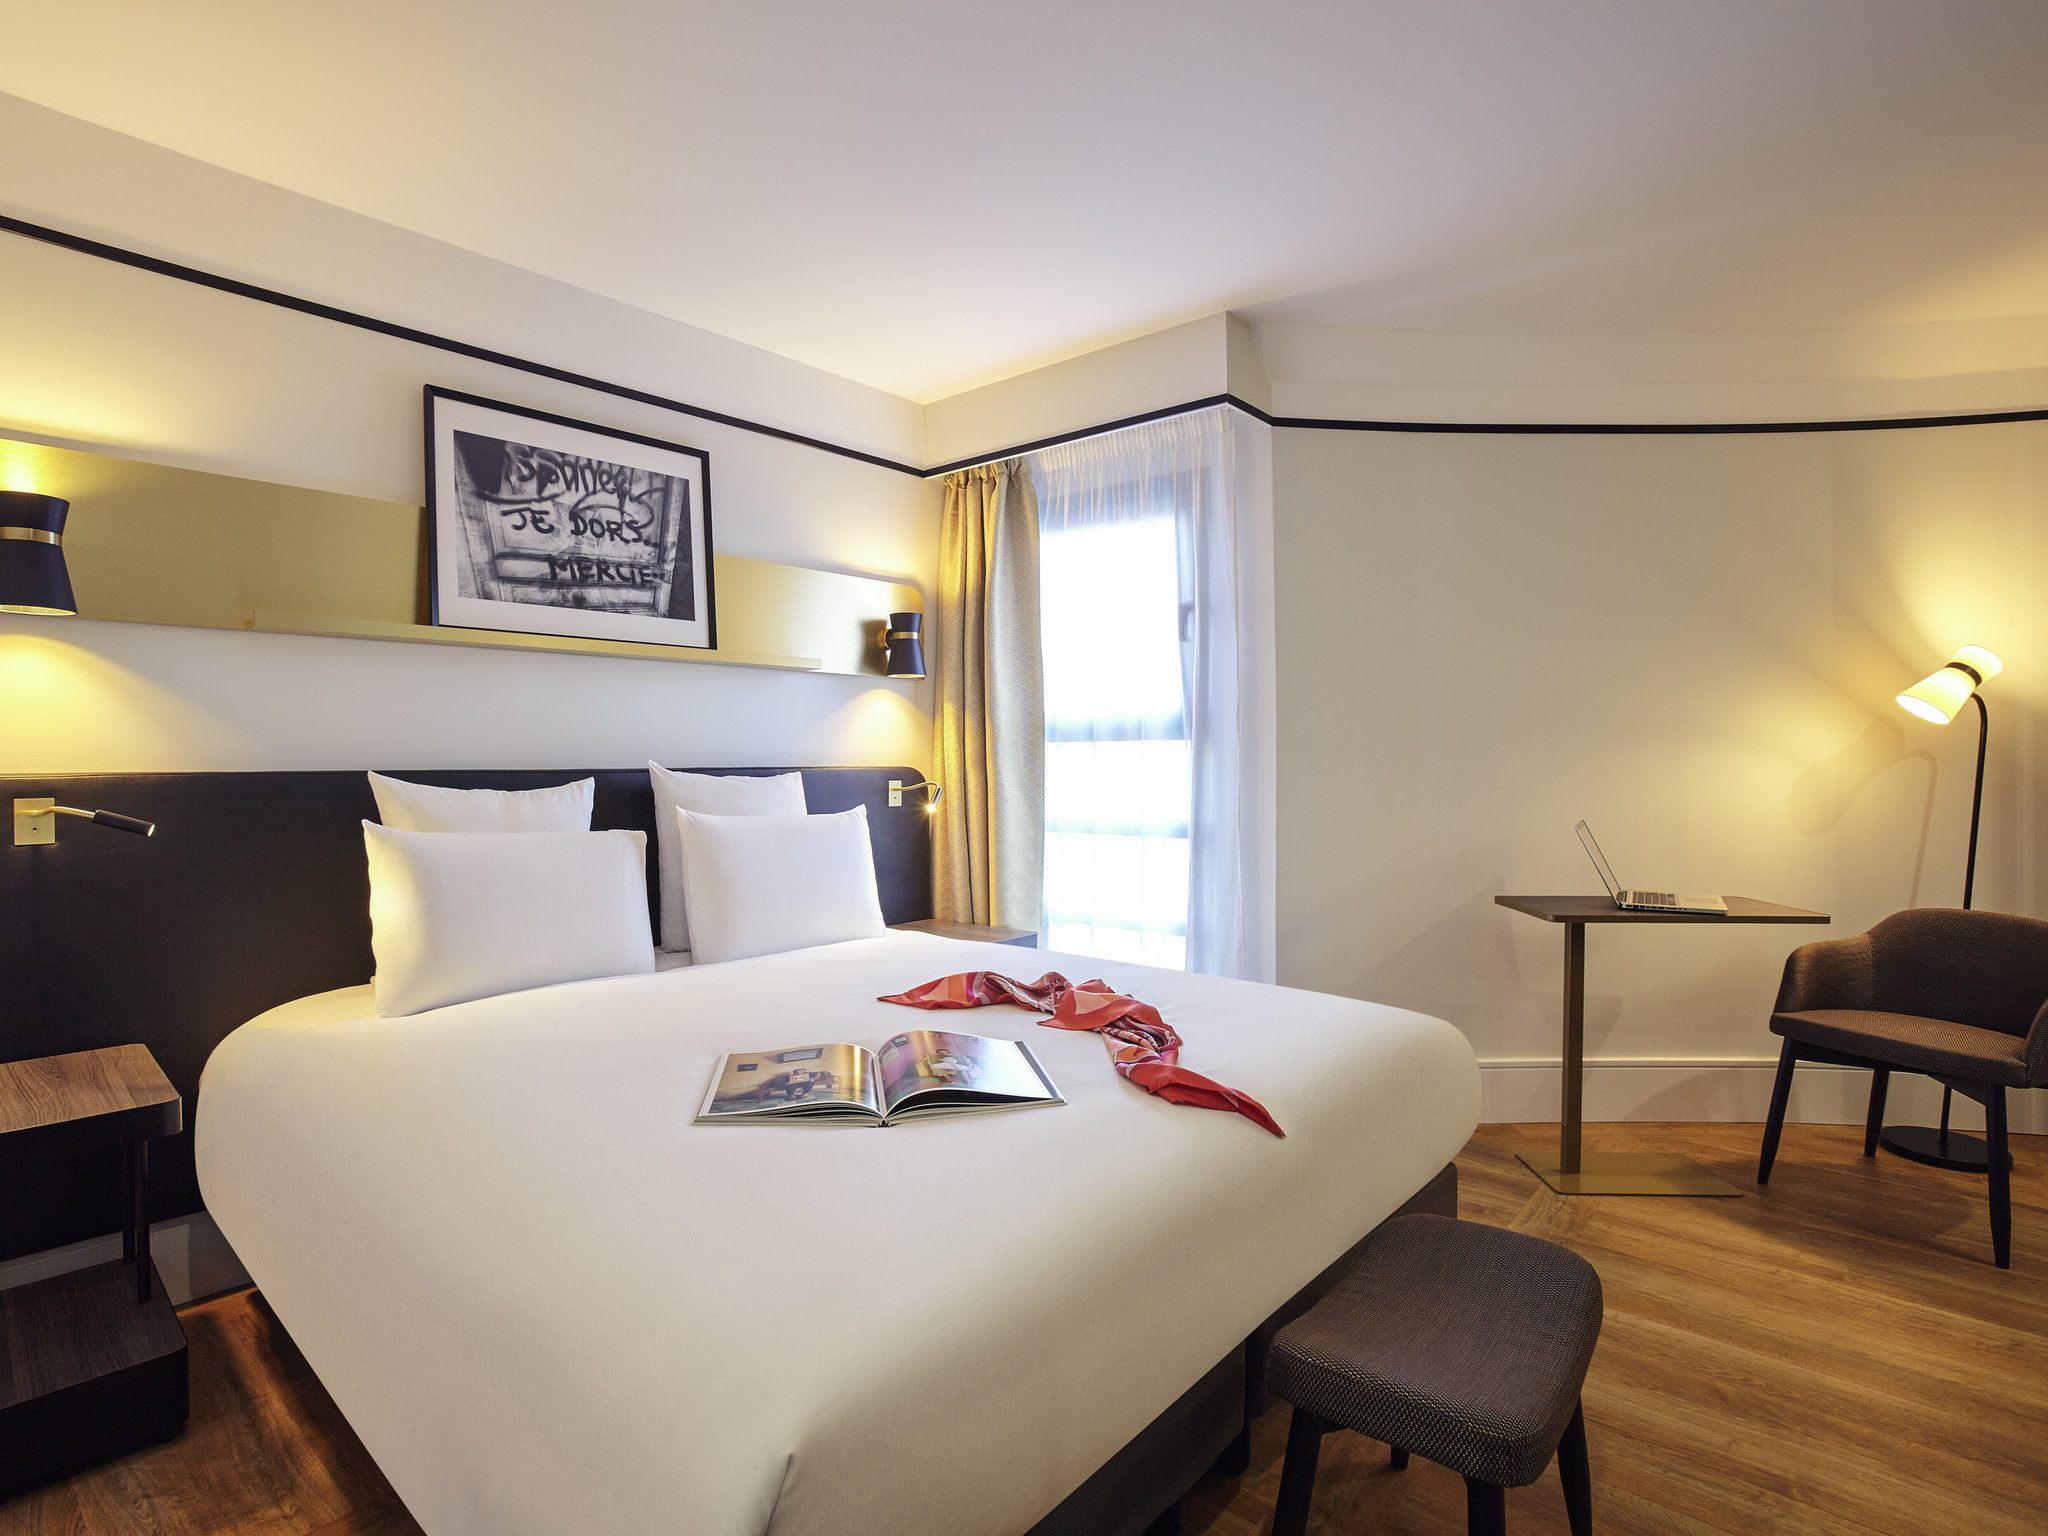 ホテル – Hôtel Mercure Paris Saint-Ouen (ex Manhattan)